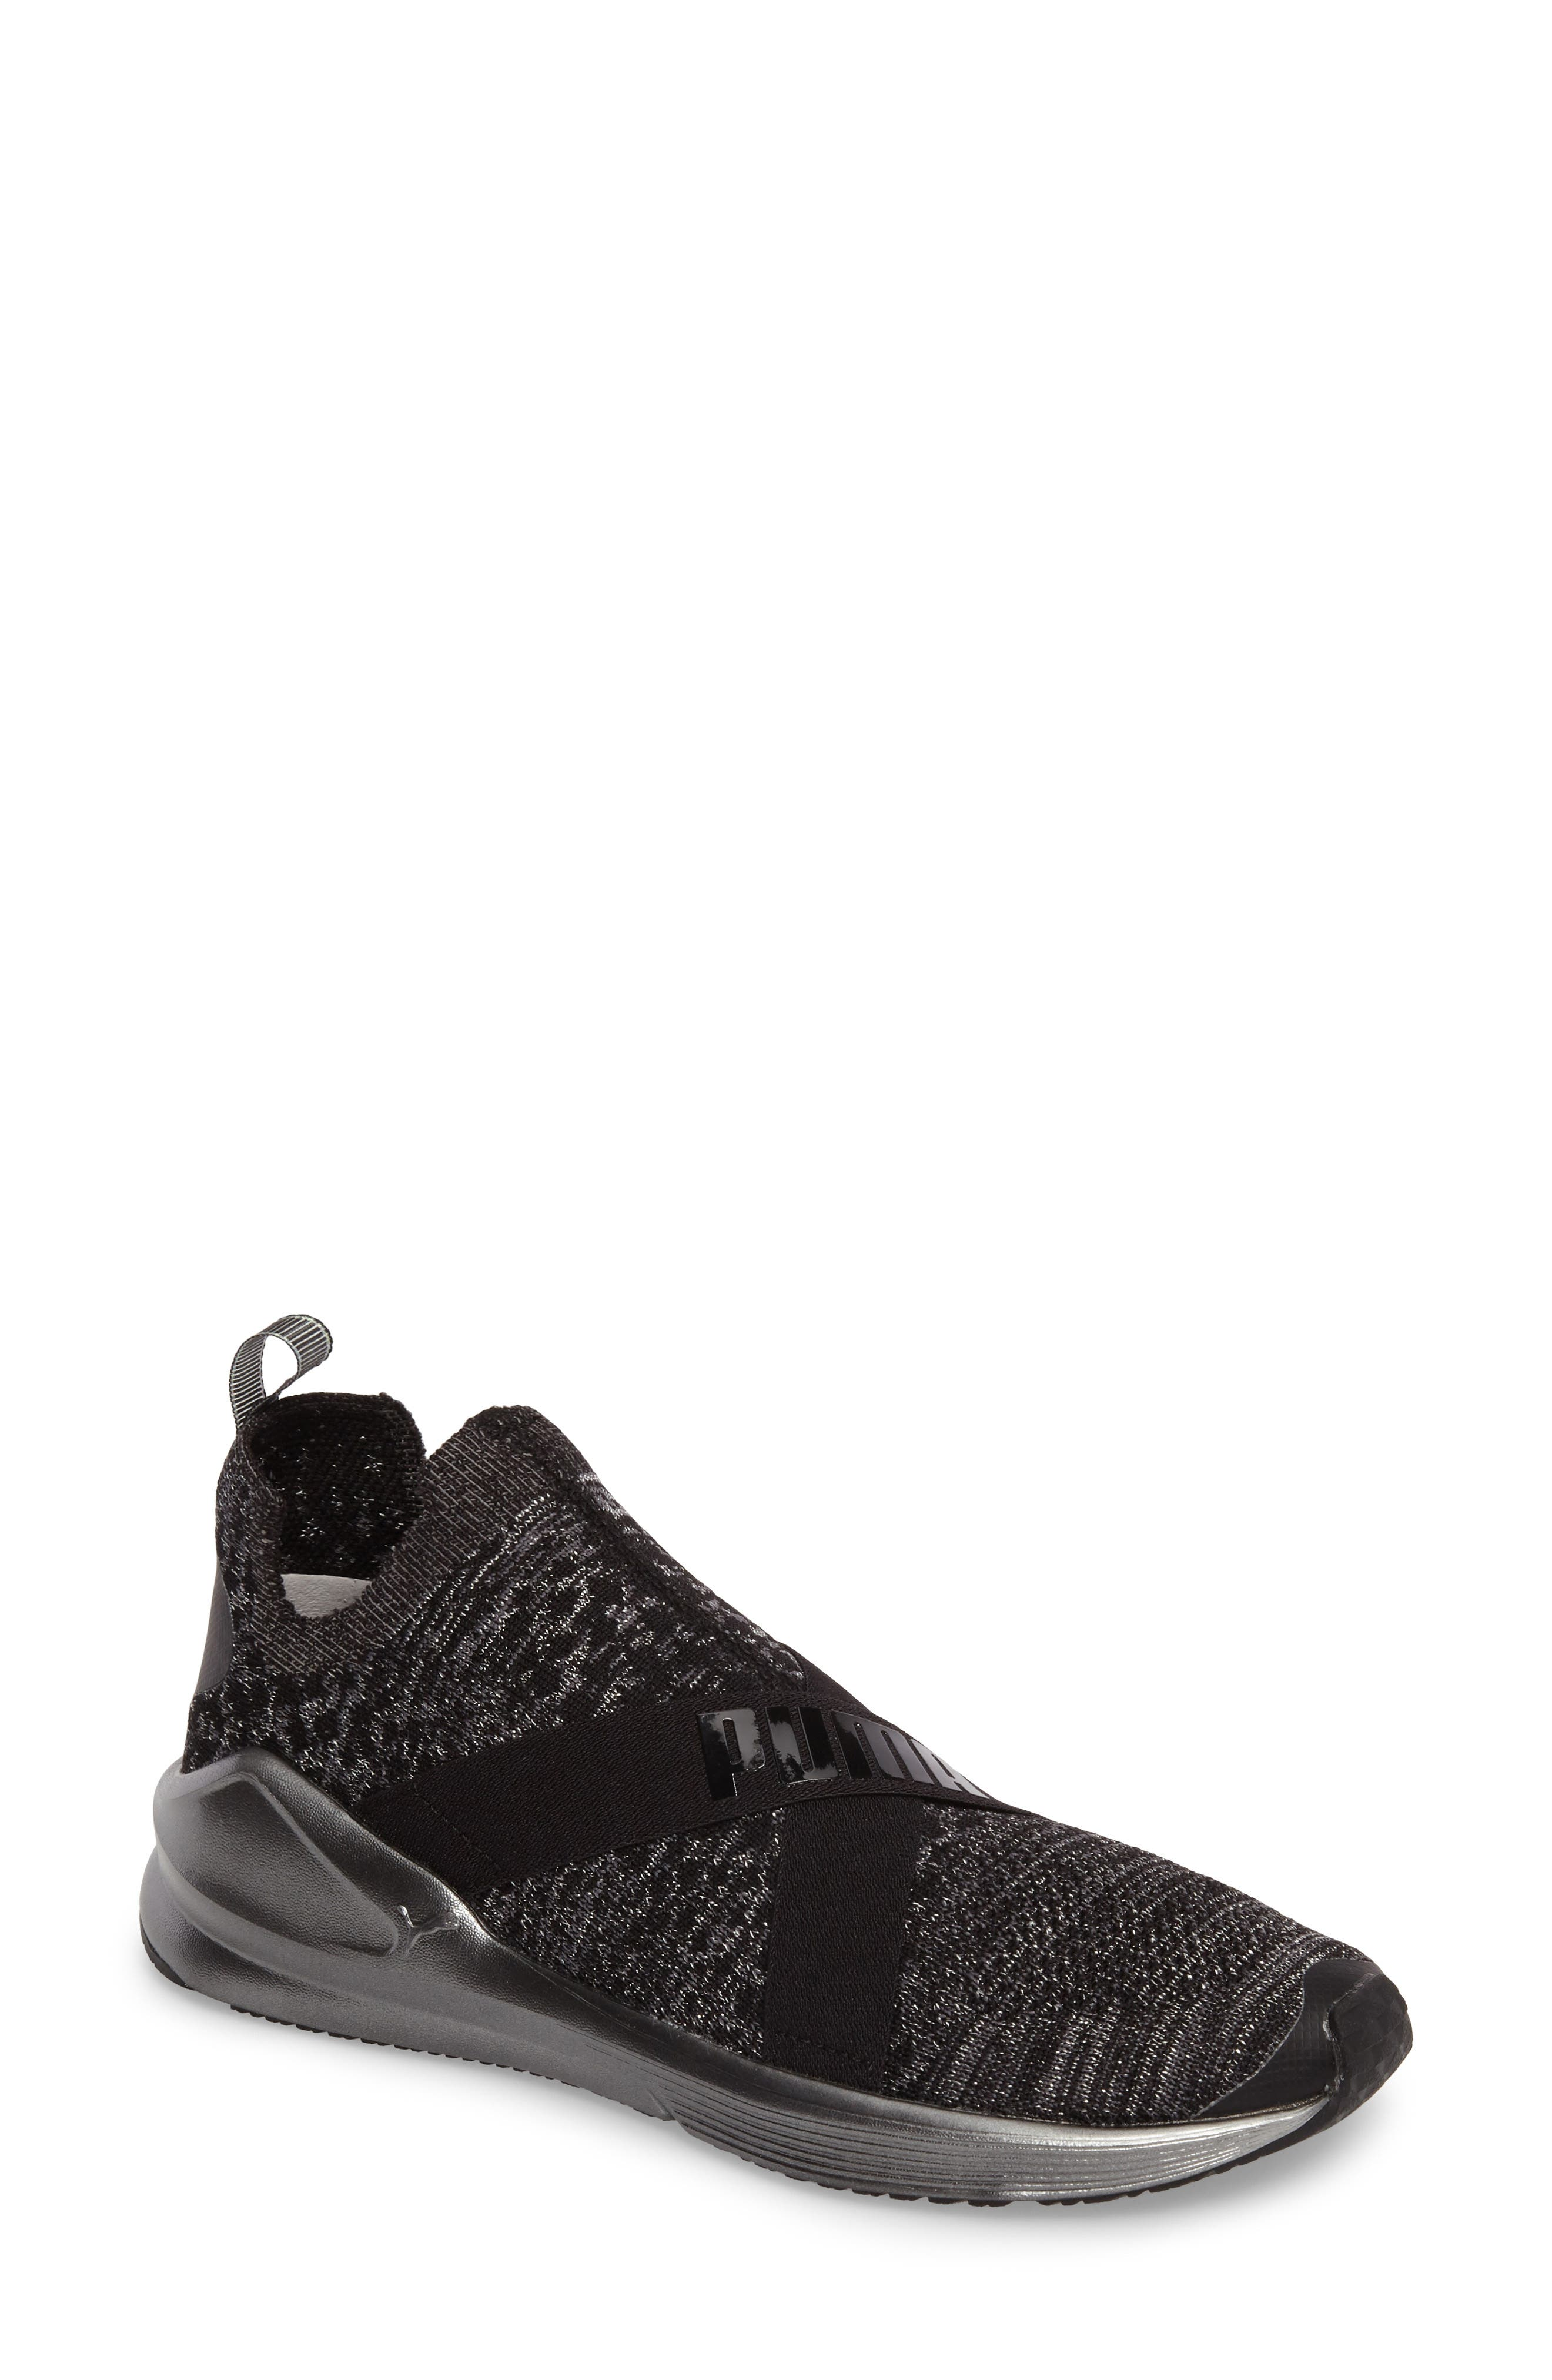 Fierce evoKnit Training Sneaker,                             Main thumbnail 1, color,                             003